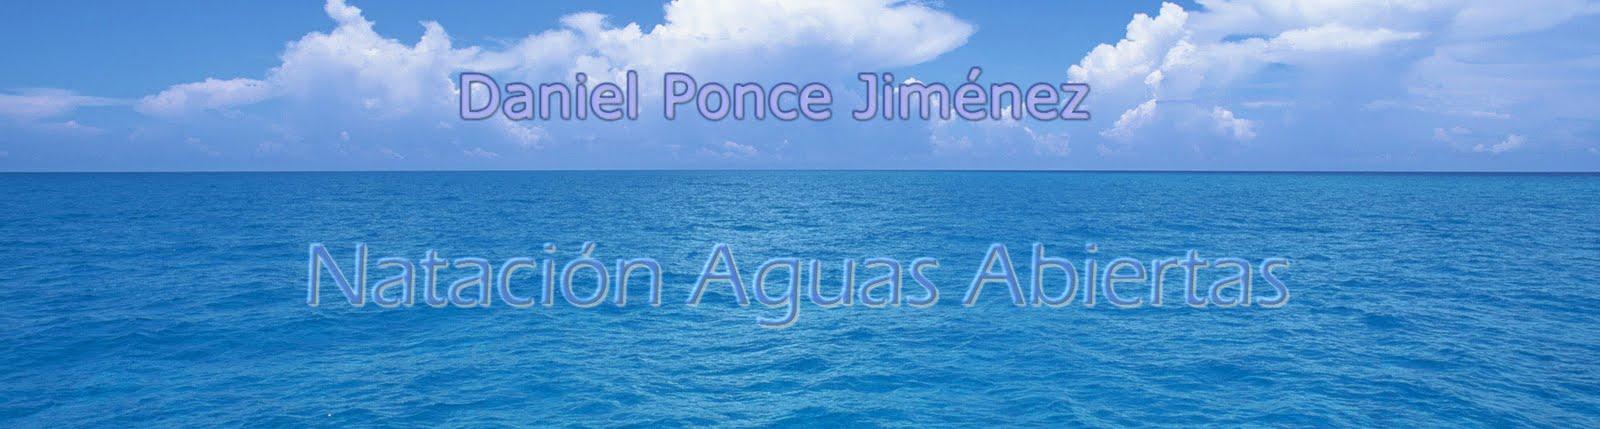 "Natación Aguas Abiertas "" Daniel Ponce Jiménez"""